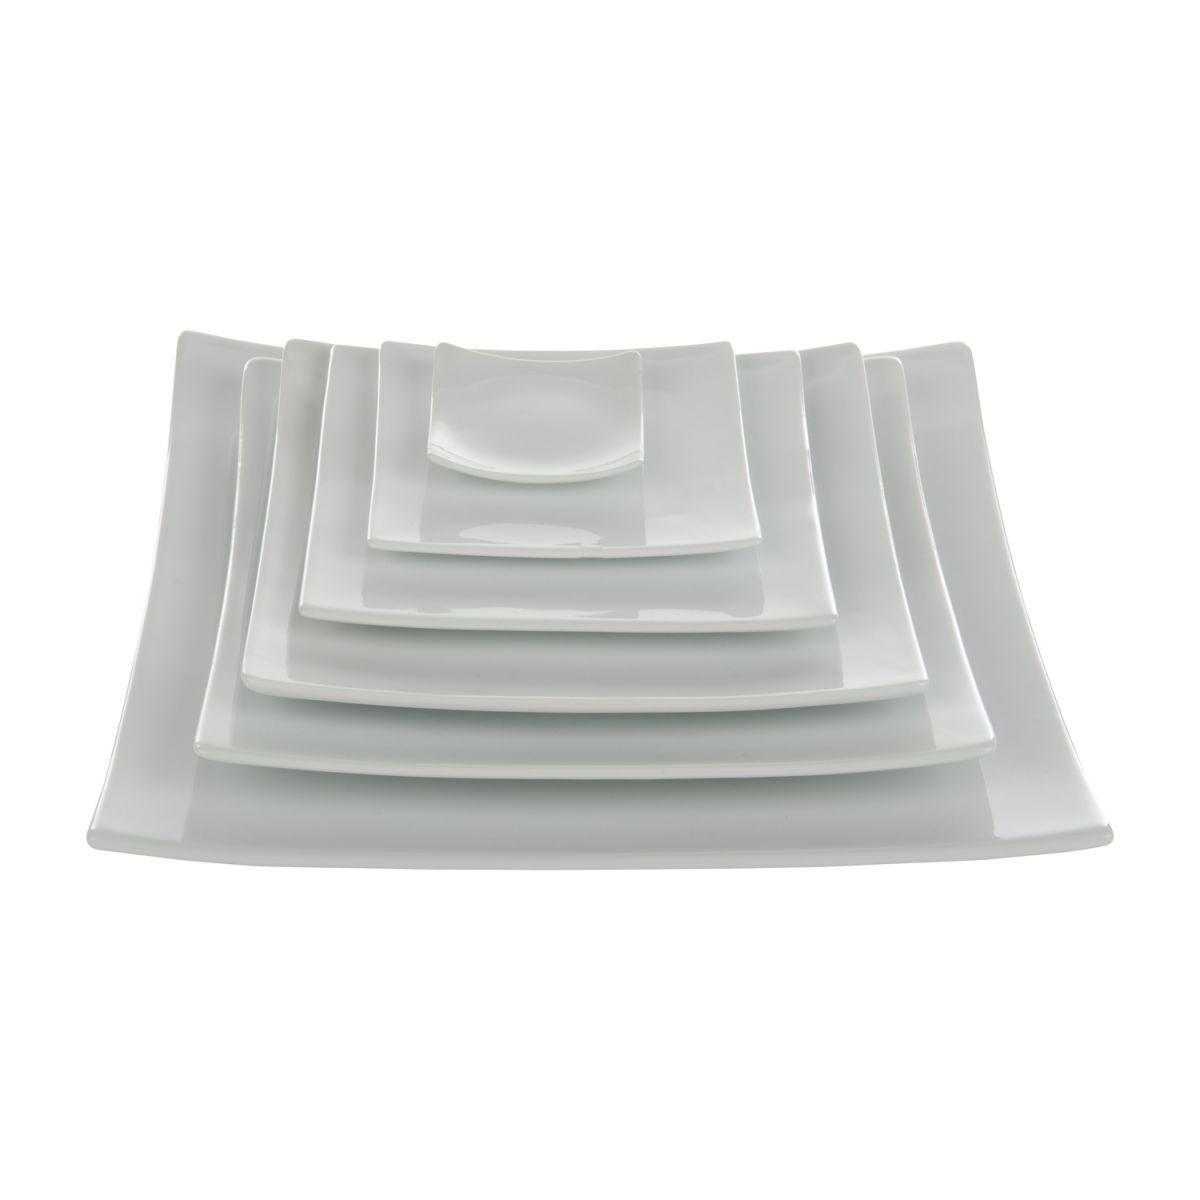 plate plain square 23 x 23 cm box3